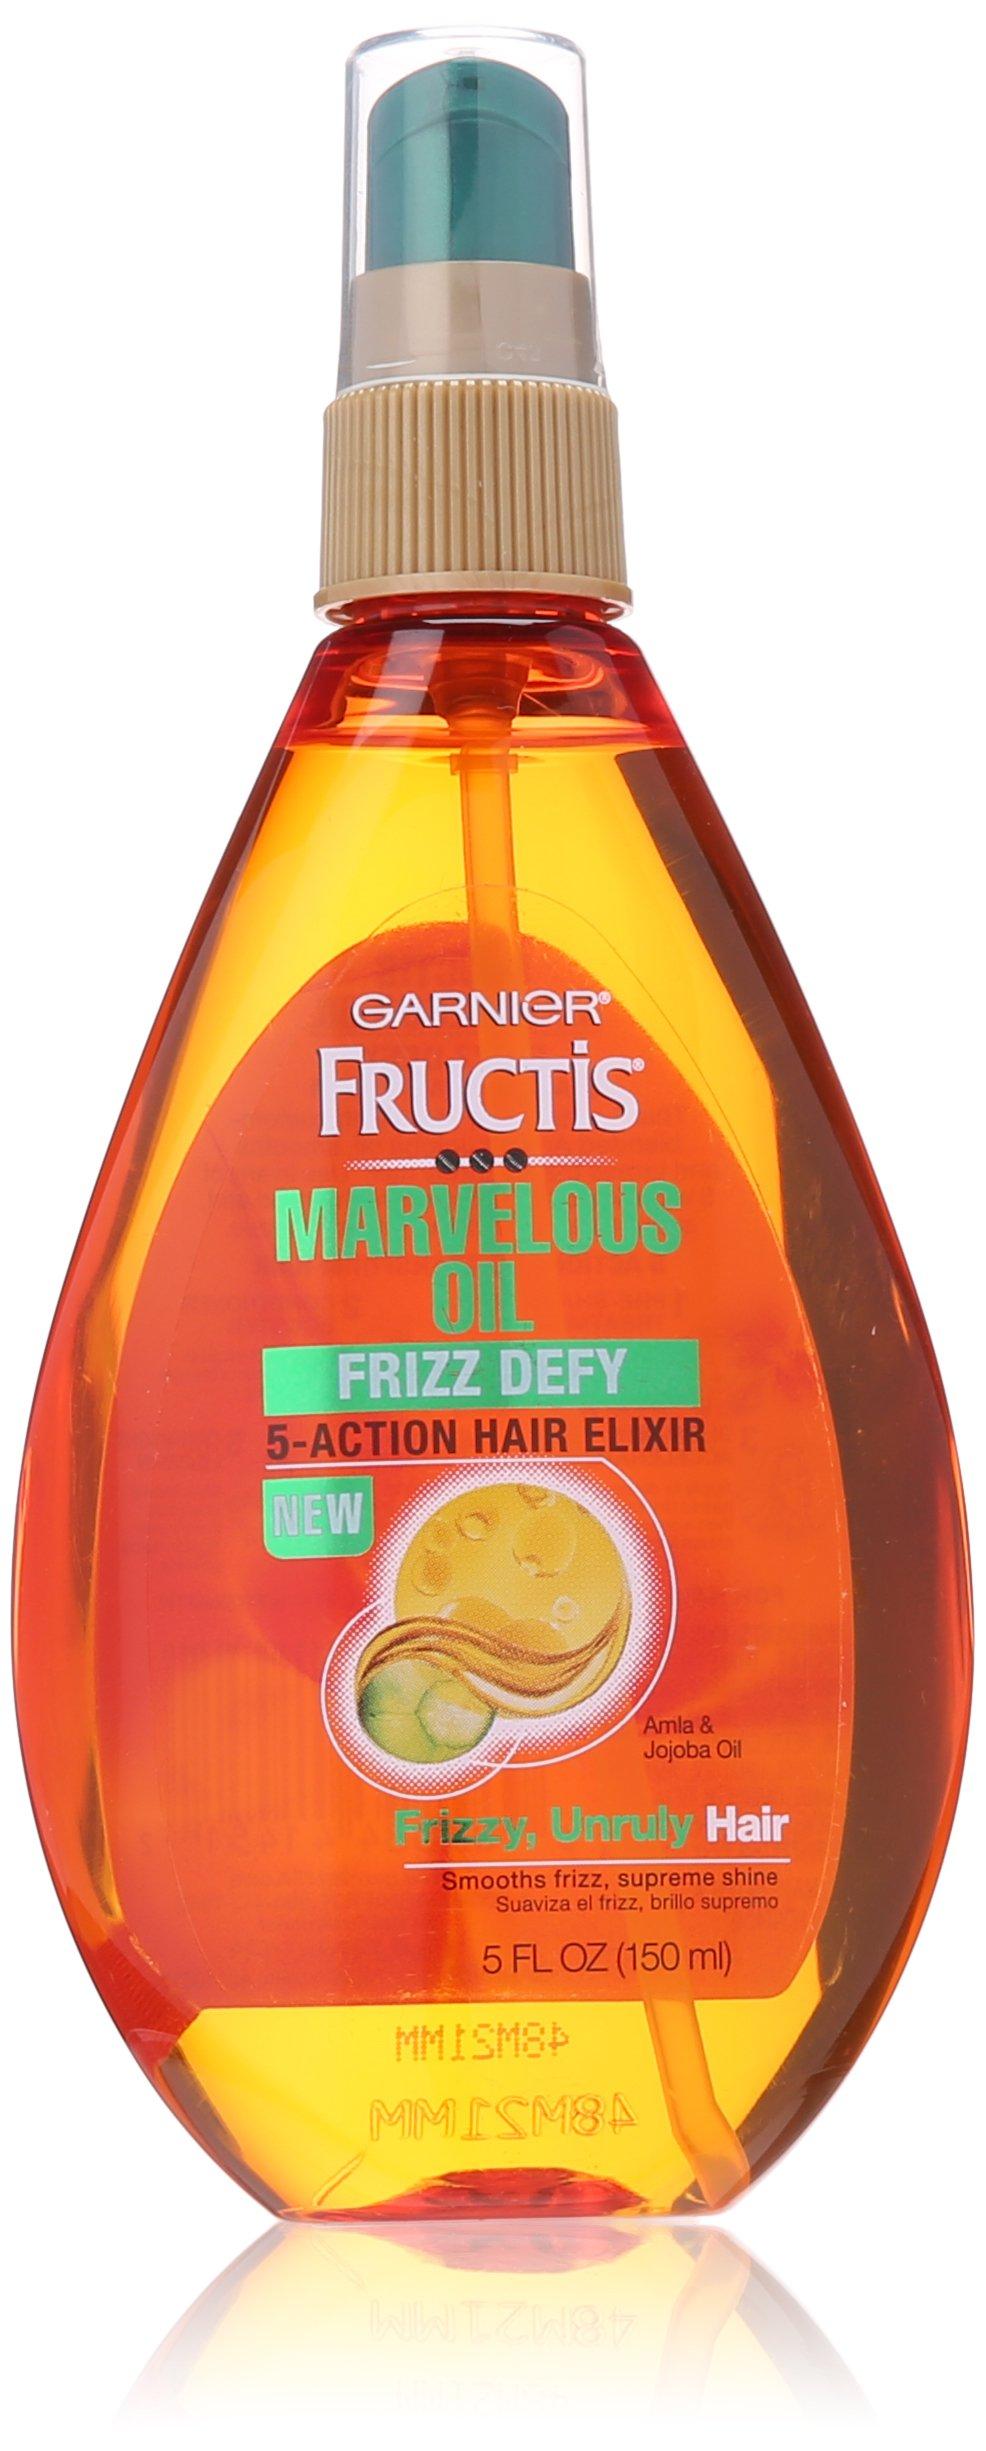 Garnier Fructis Marvelous Action Elixir